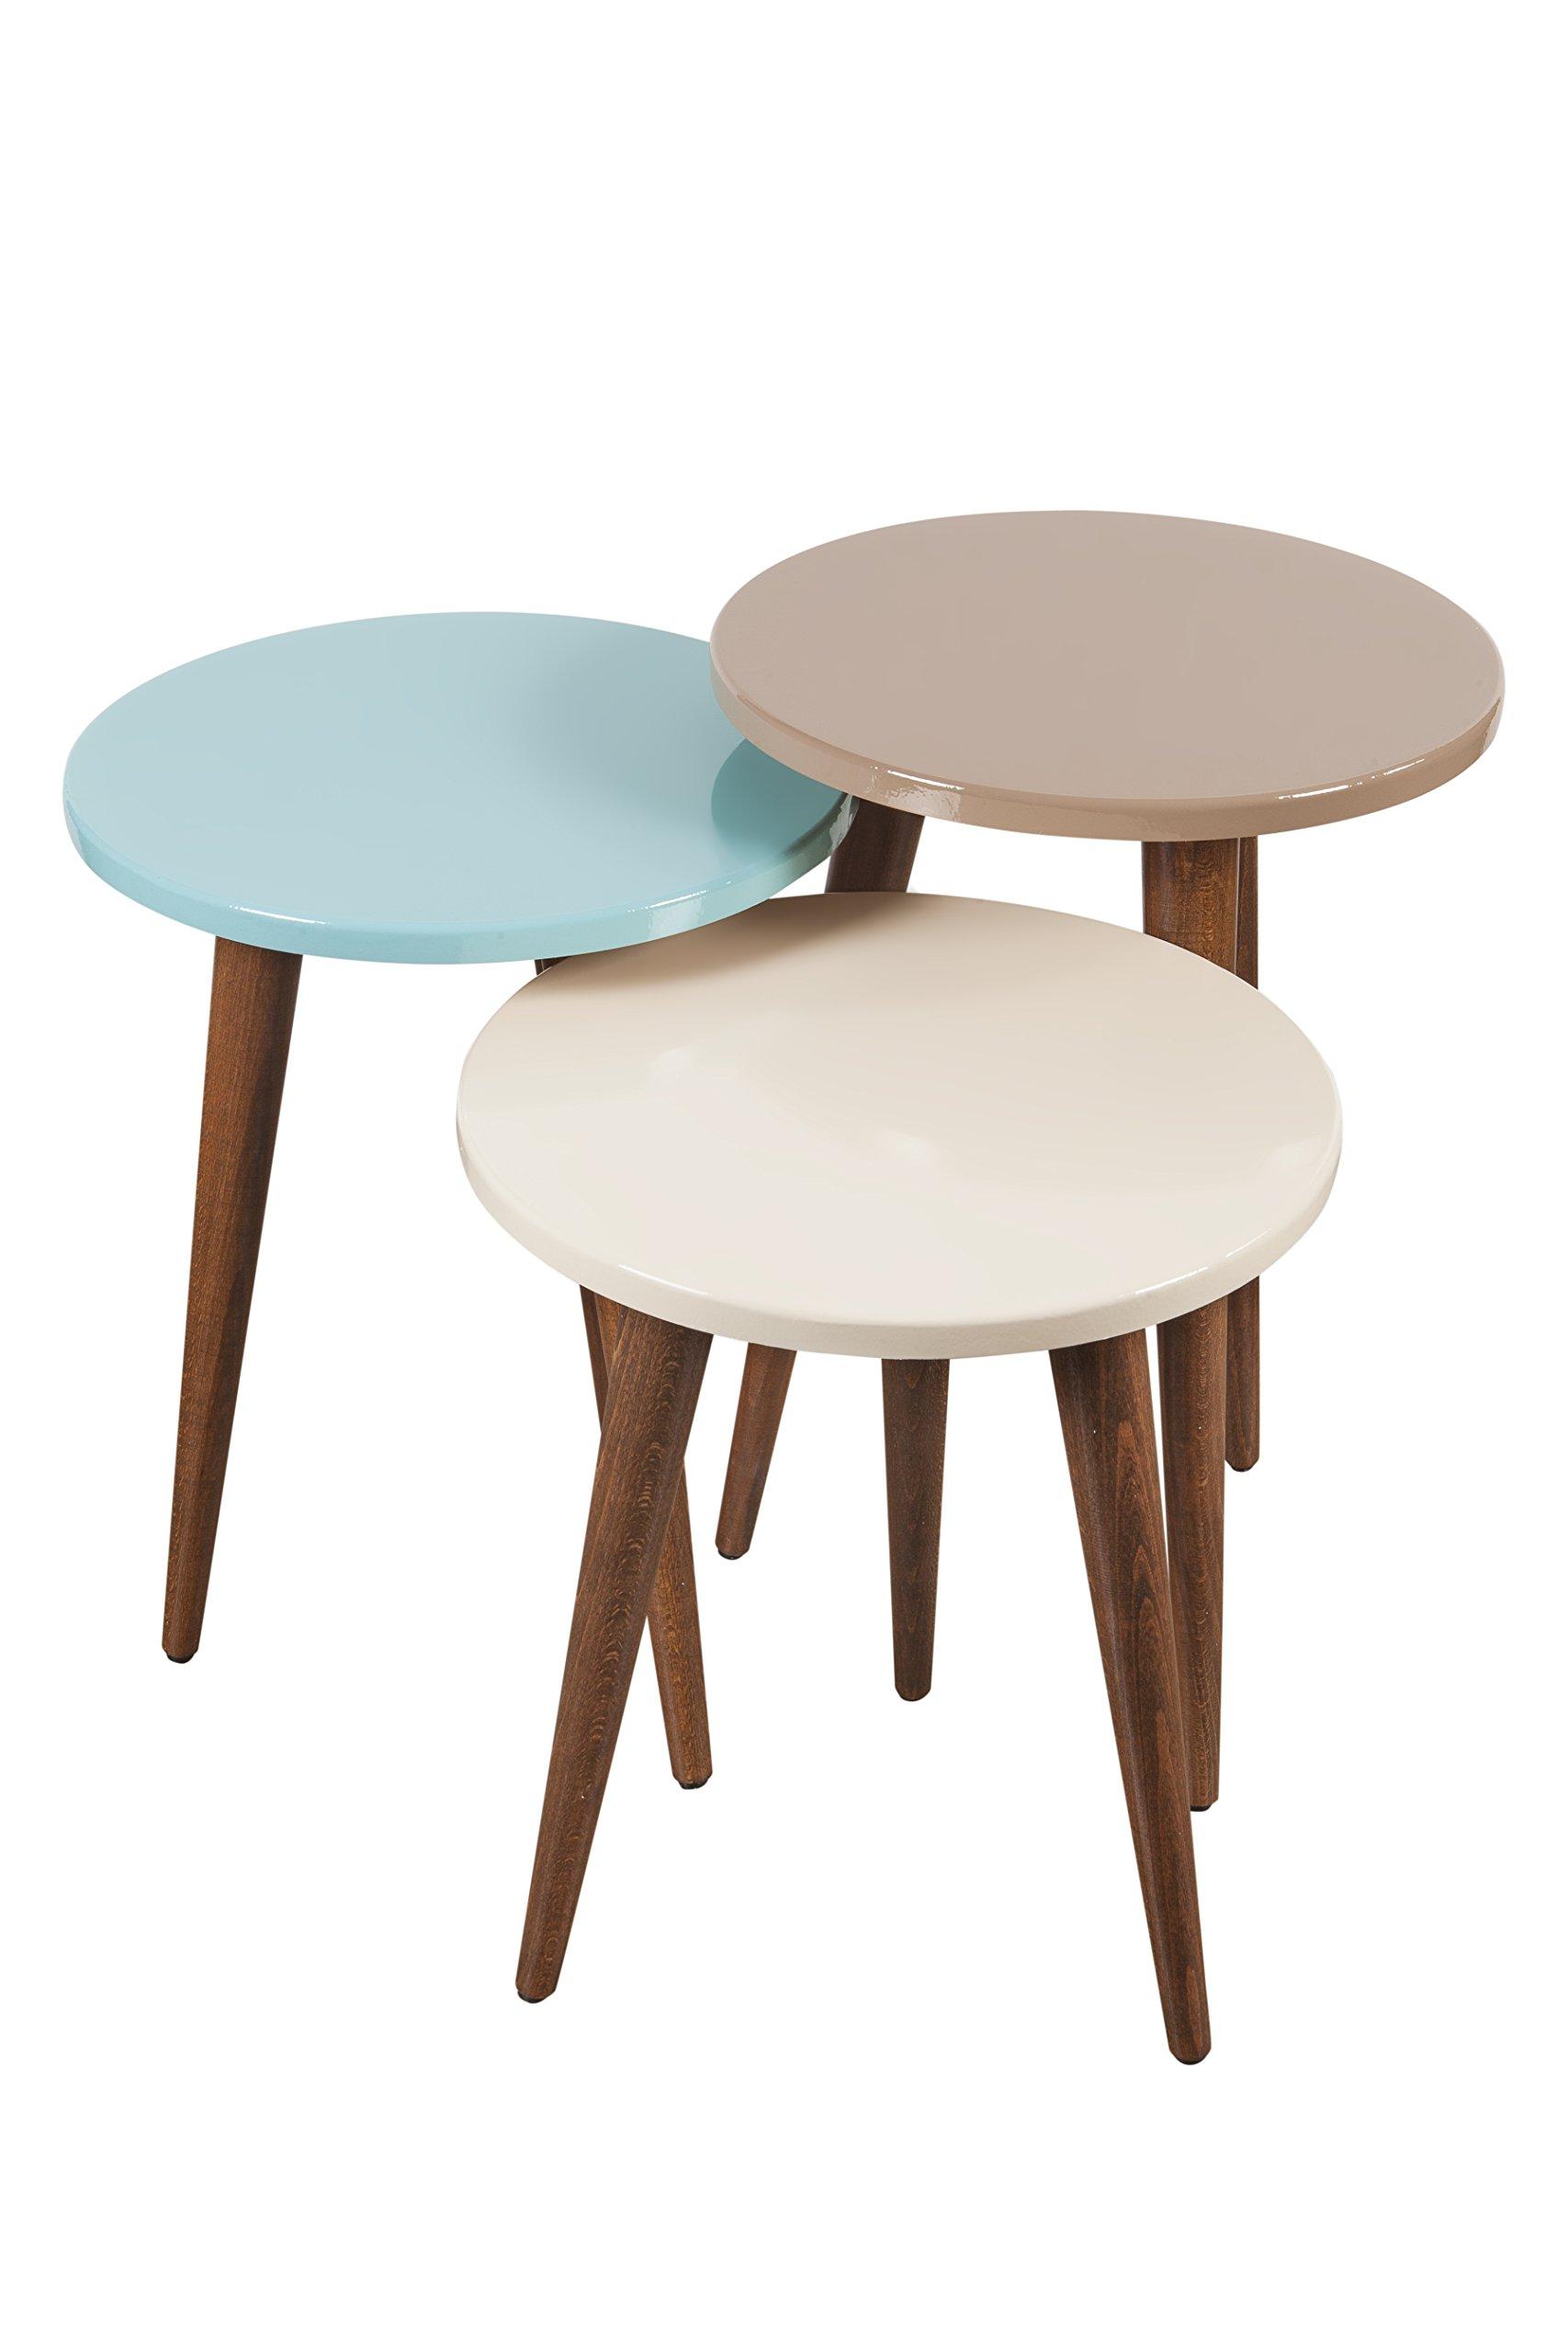 Decorotika - Tale 3-Piece Accent Nesting Table Set